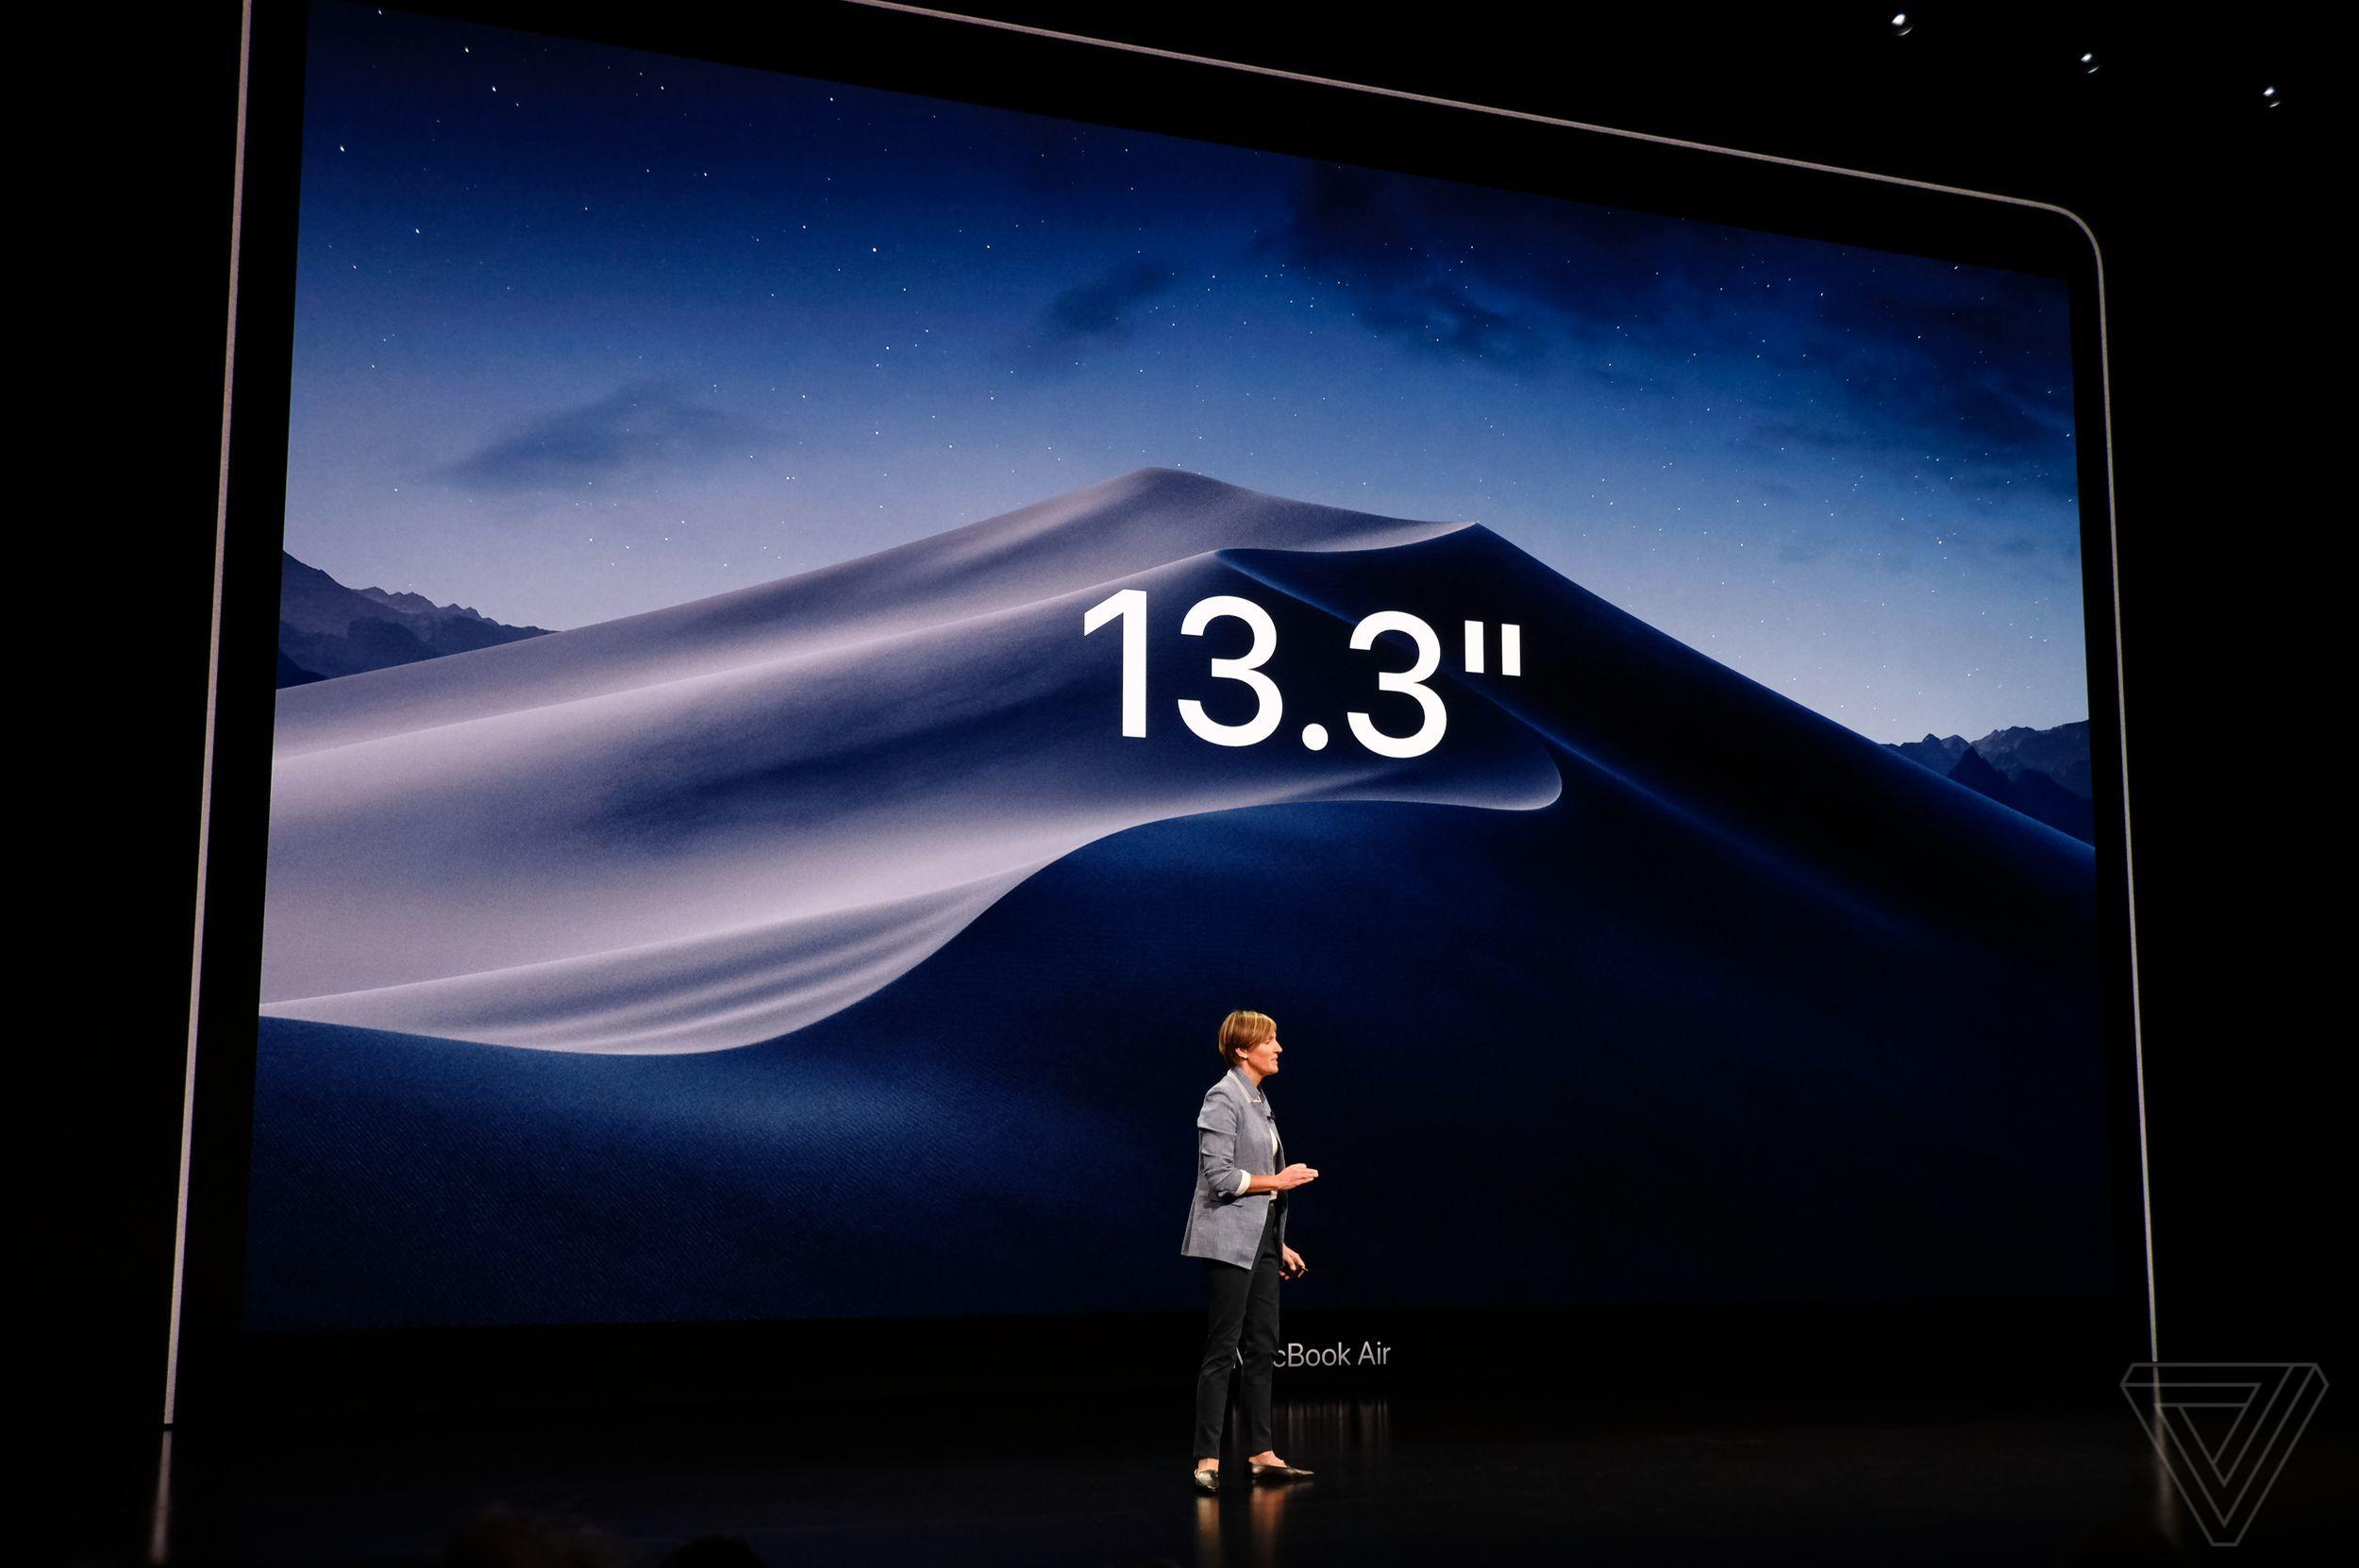 Apple MacBook Air 2018 mit Intel Core i7 als Prototyp getestet 9